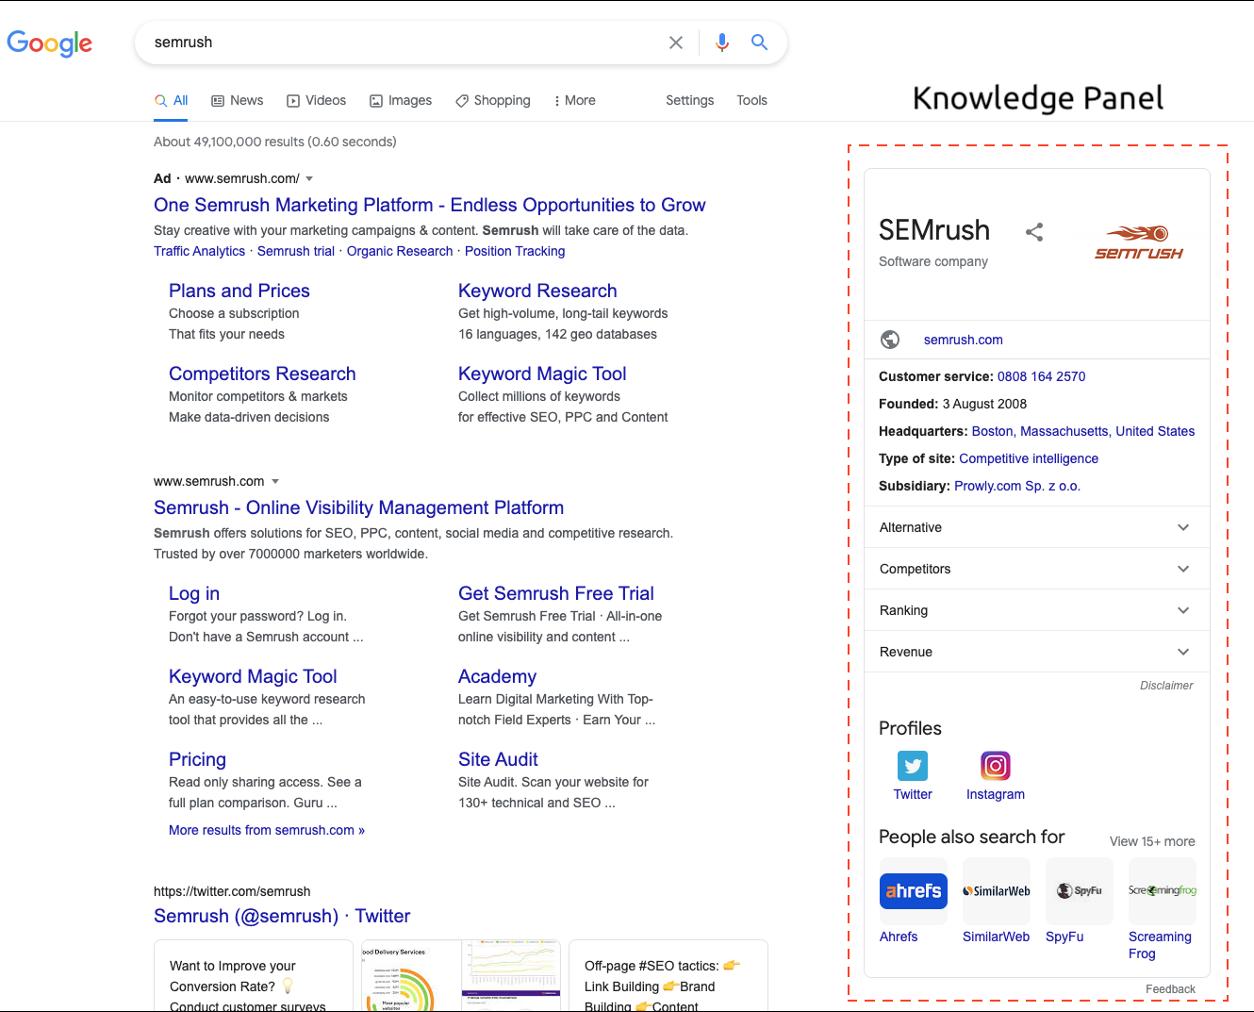 semrush knowledge panel